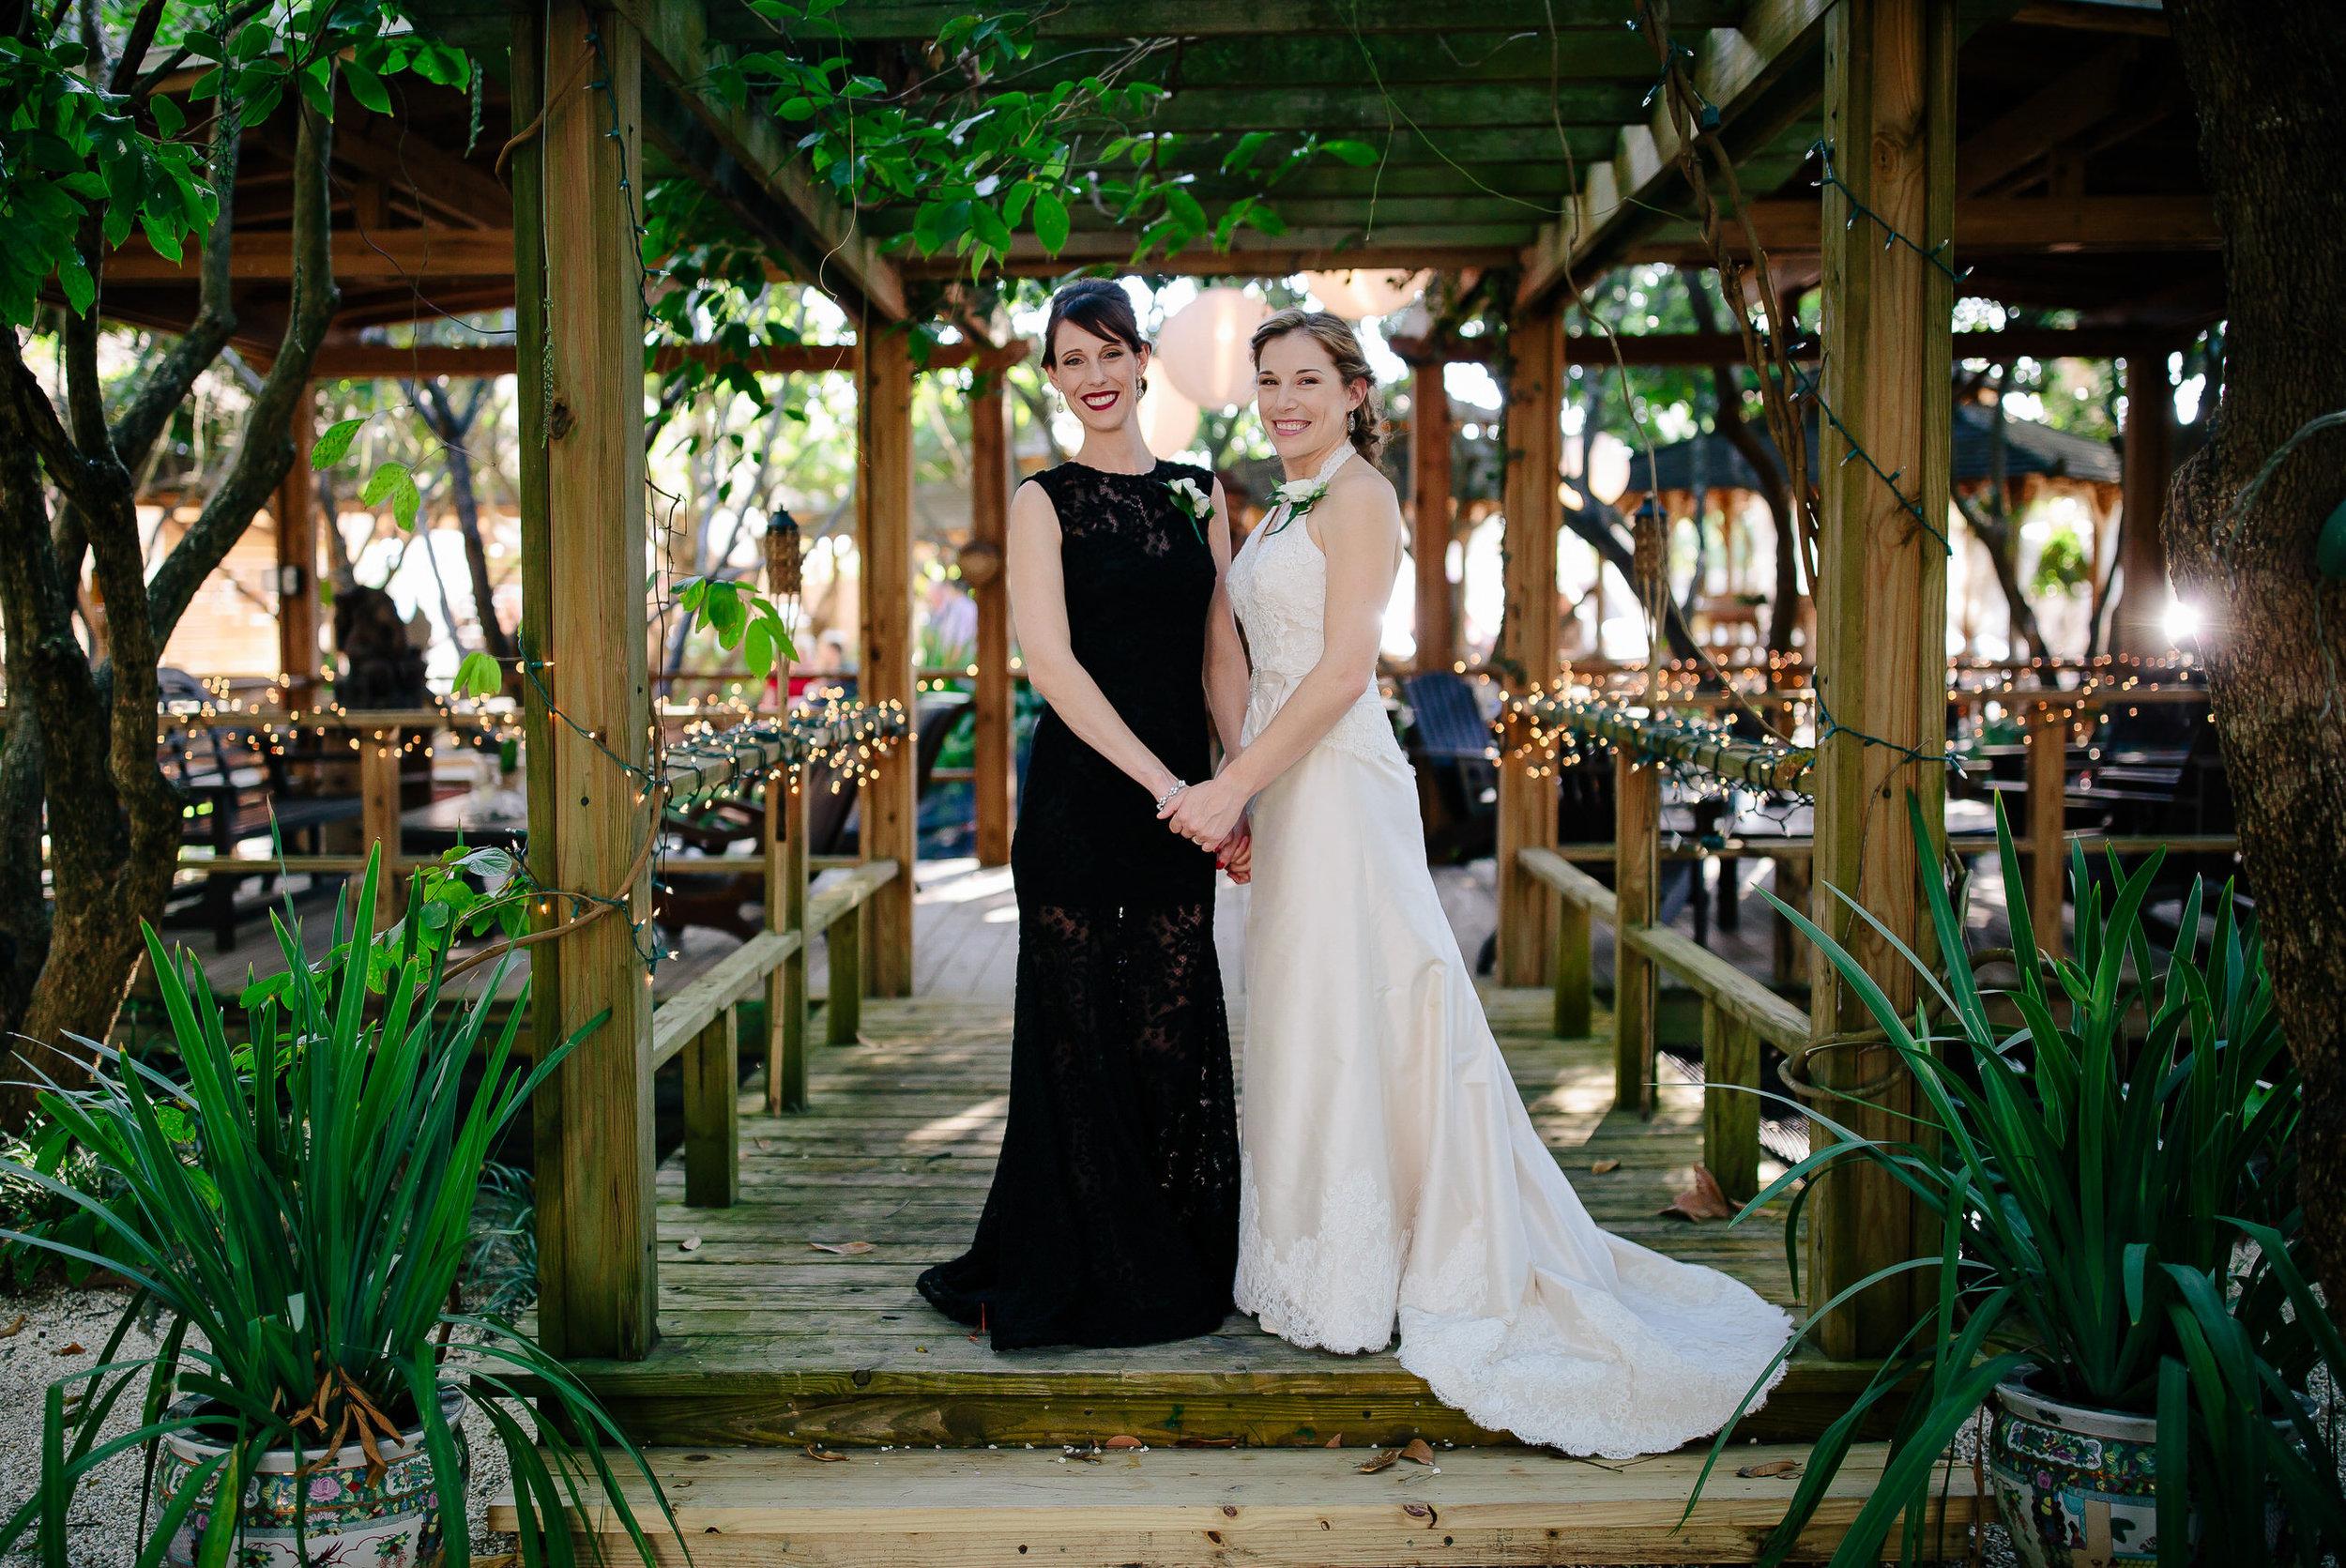 south-florida-wedding-photographer-tiny-house-photo-50.jpg